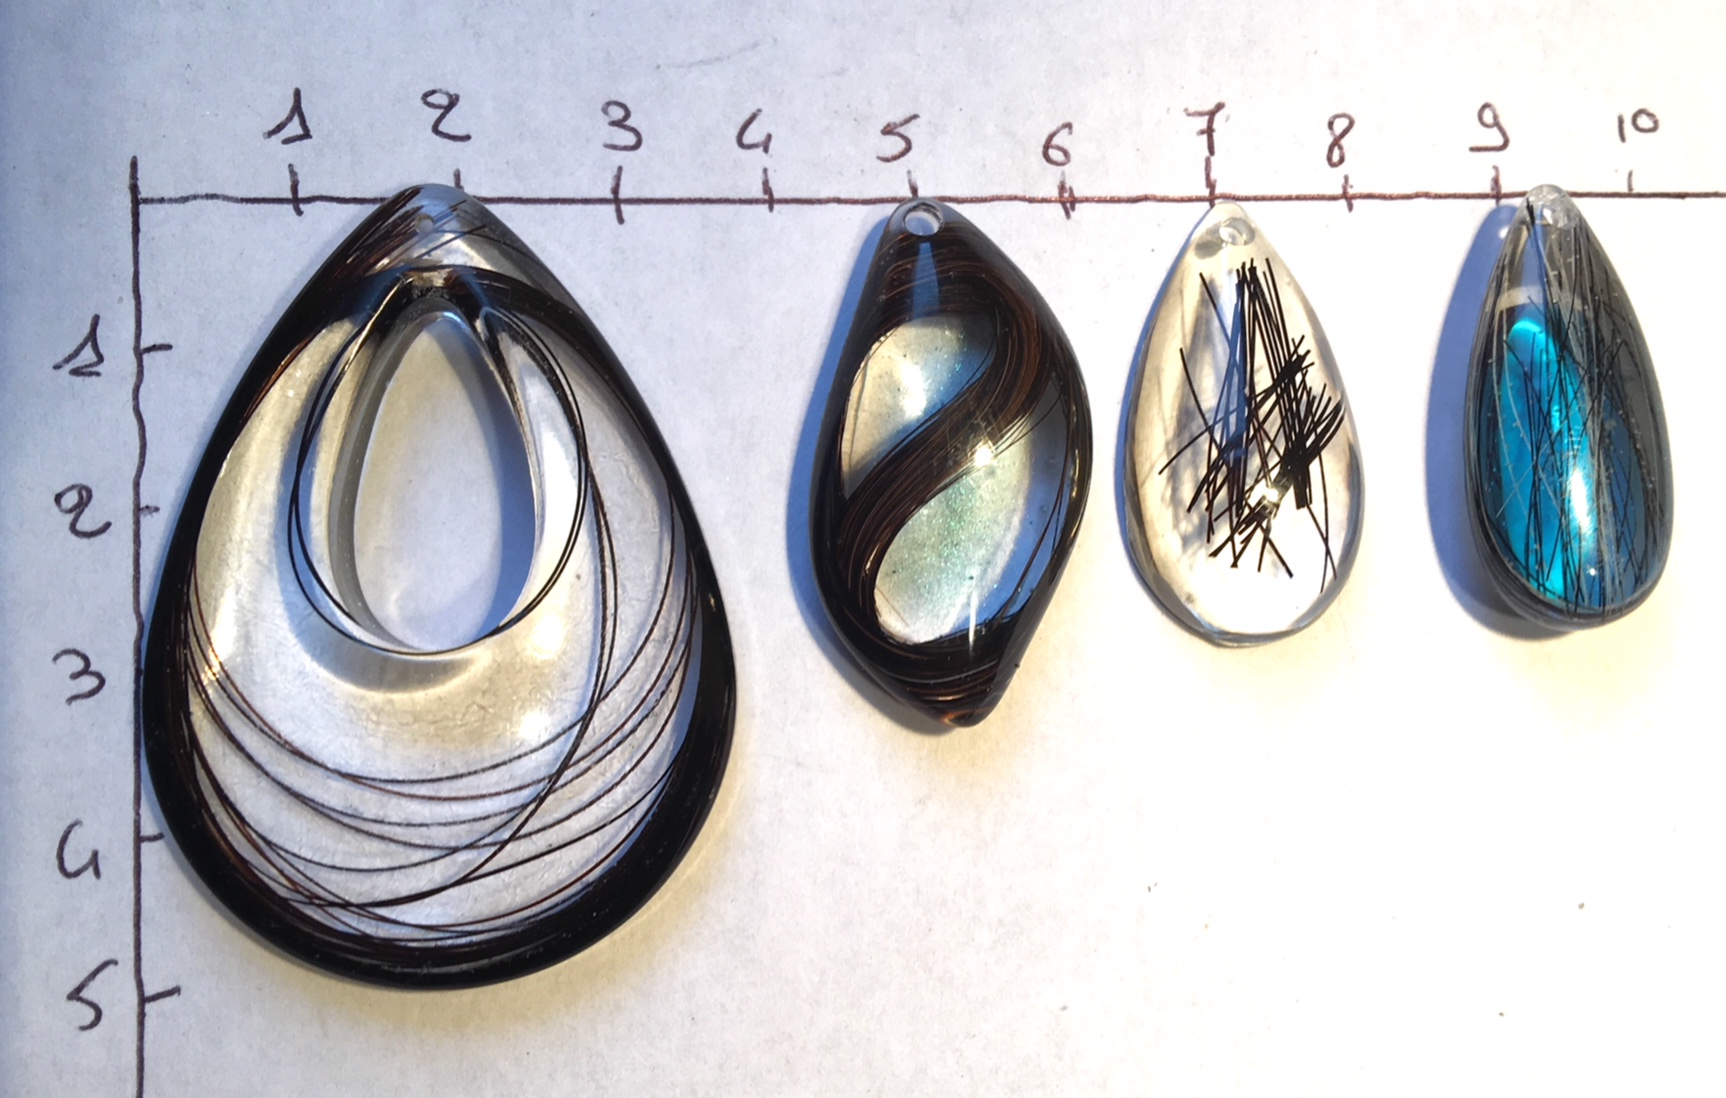 Creation crins cheval bijoux immortel pendentif taille cm comparatif